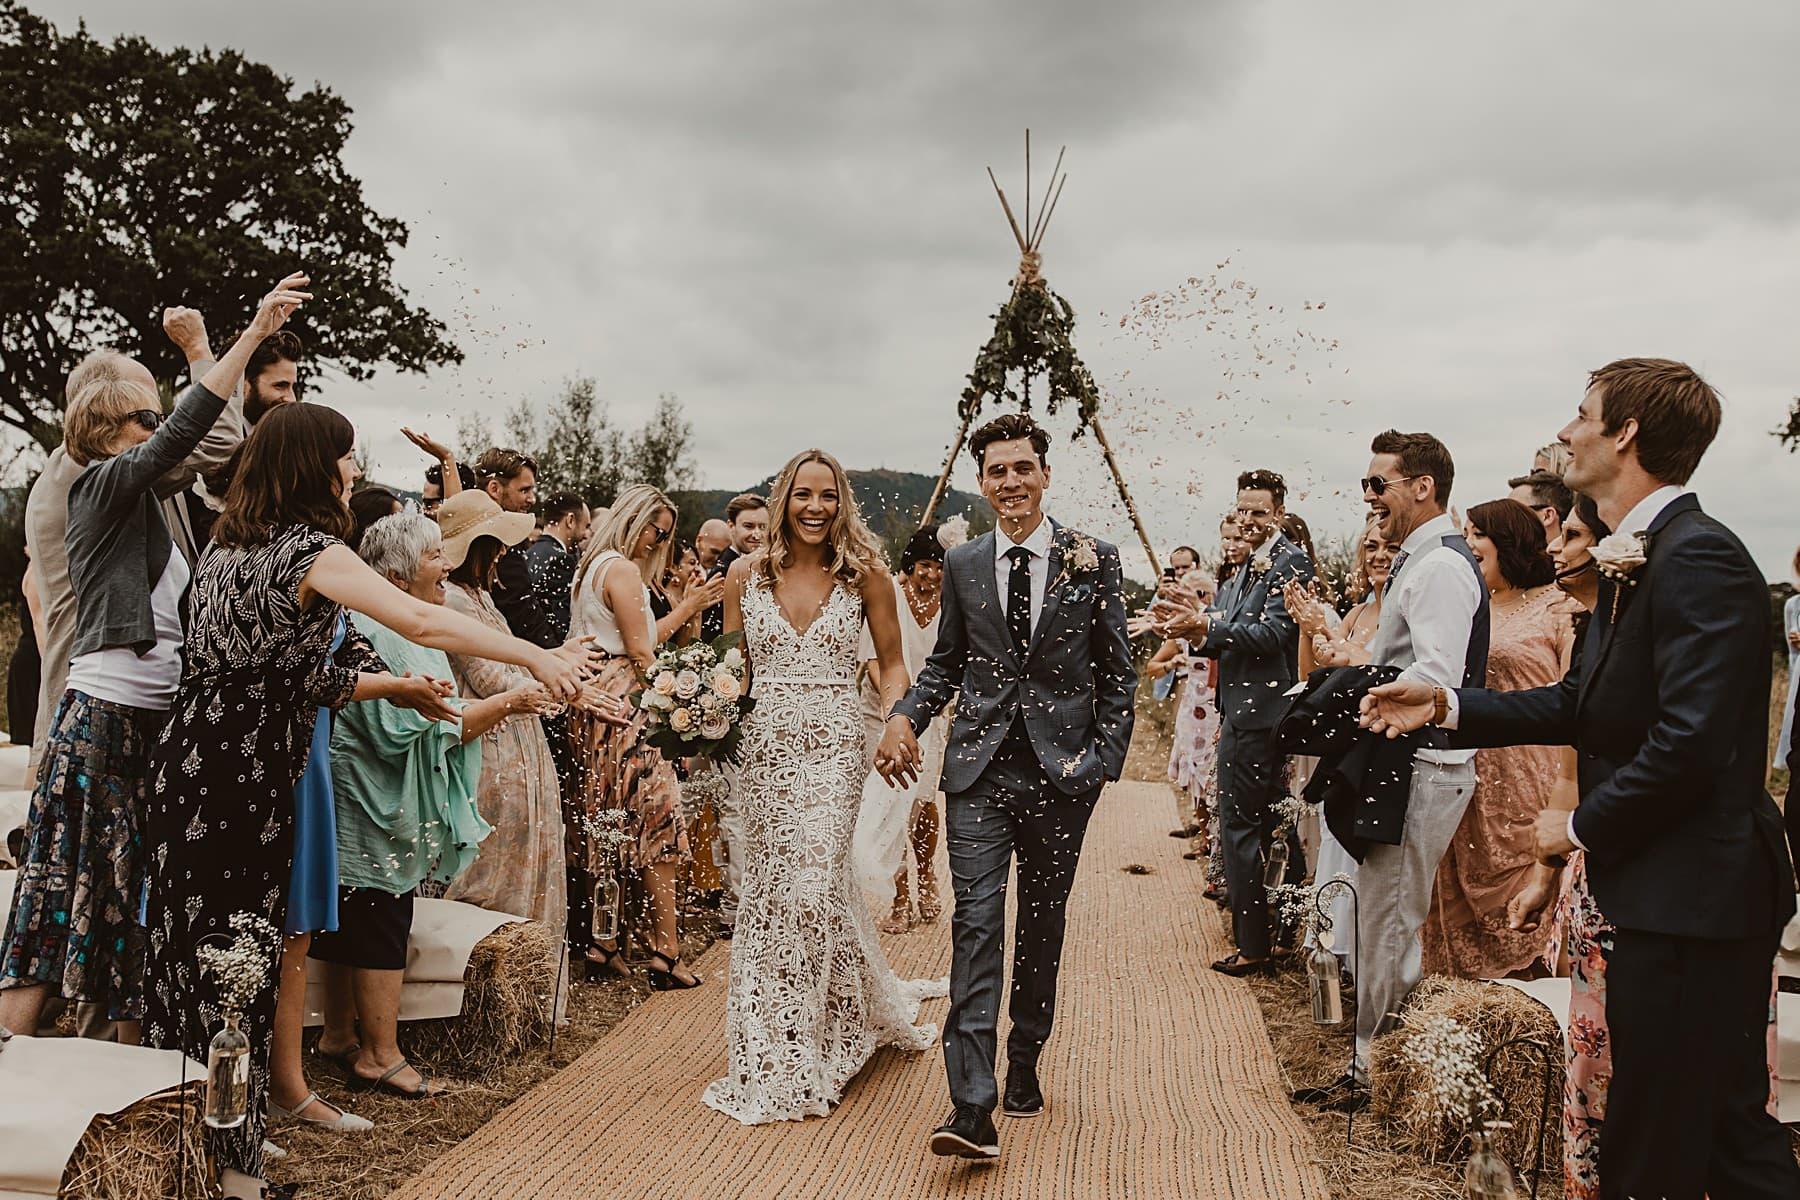 Confetti shot rustic wedding, naked tipi